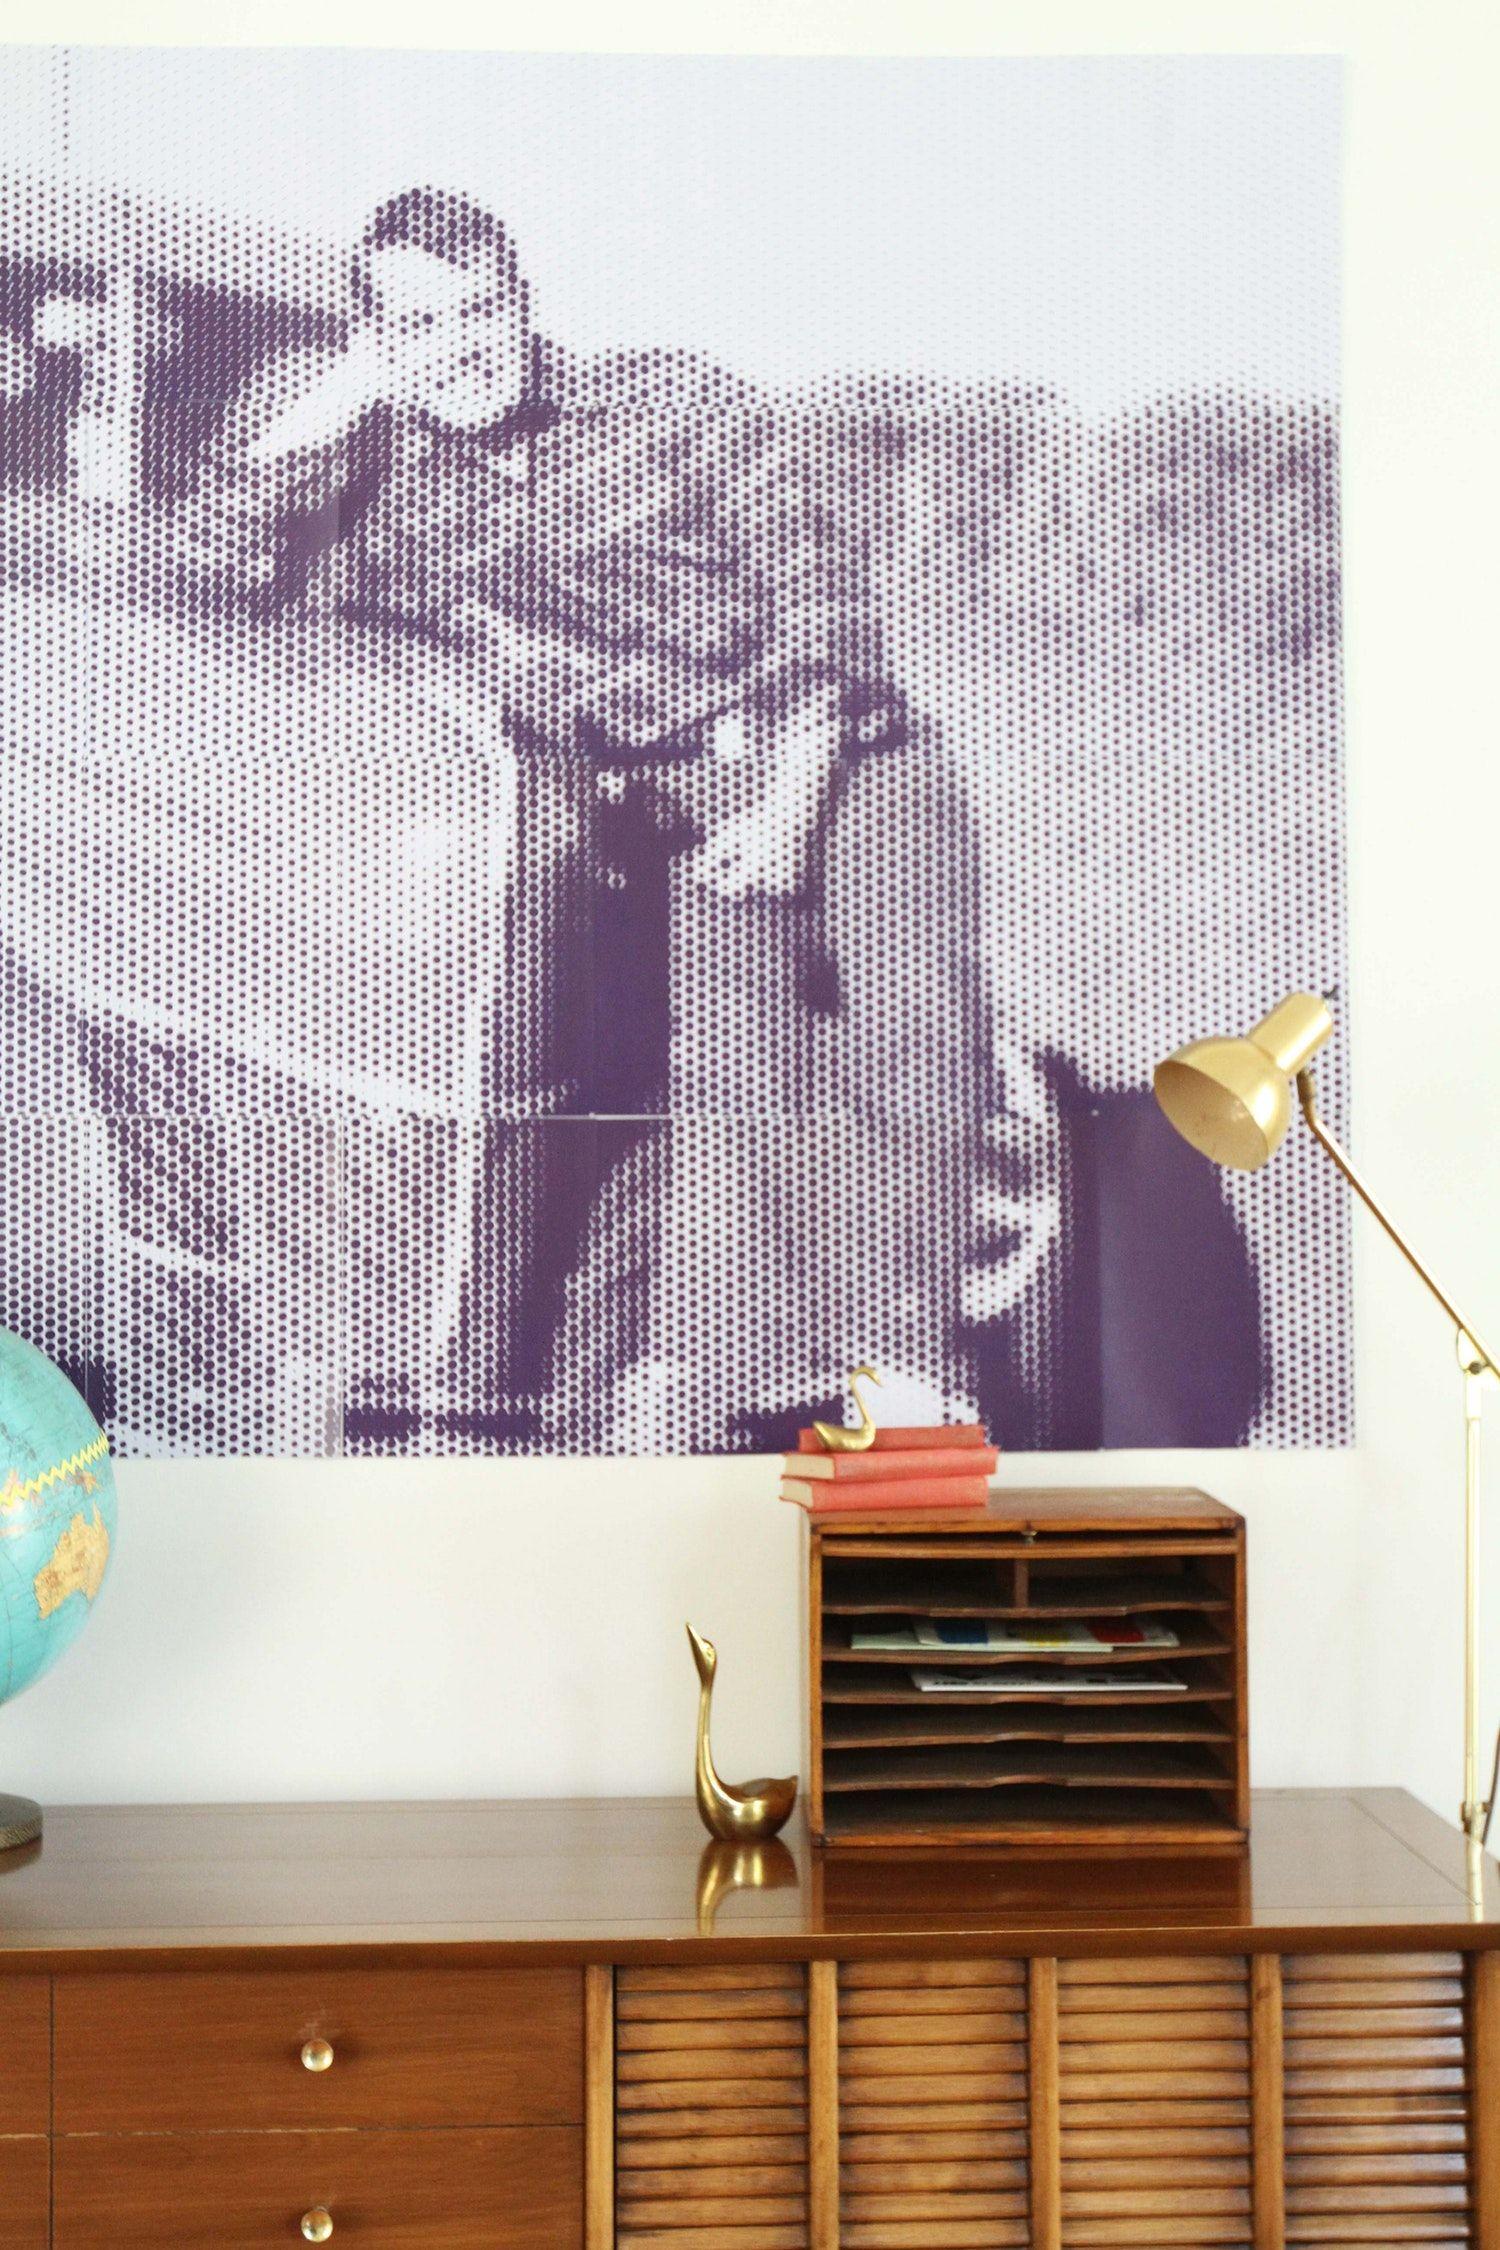 How To Use The Rasterbator to Create Scale Wall Art